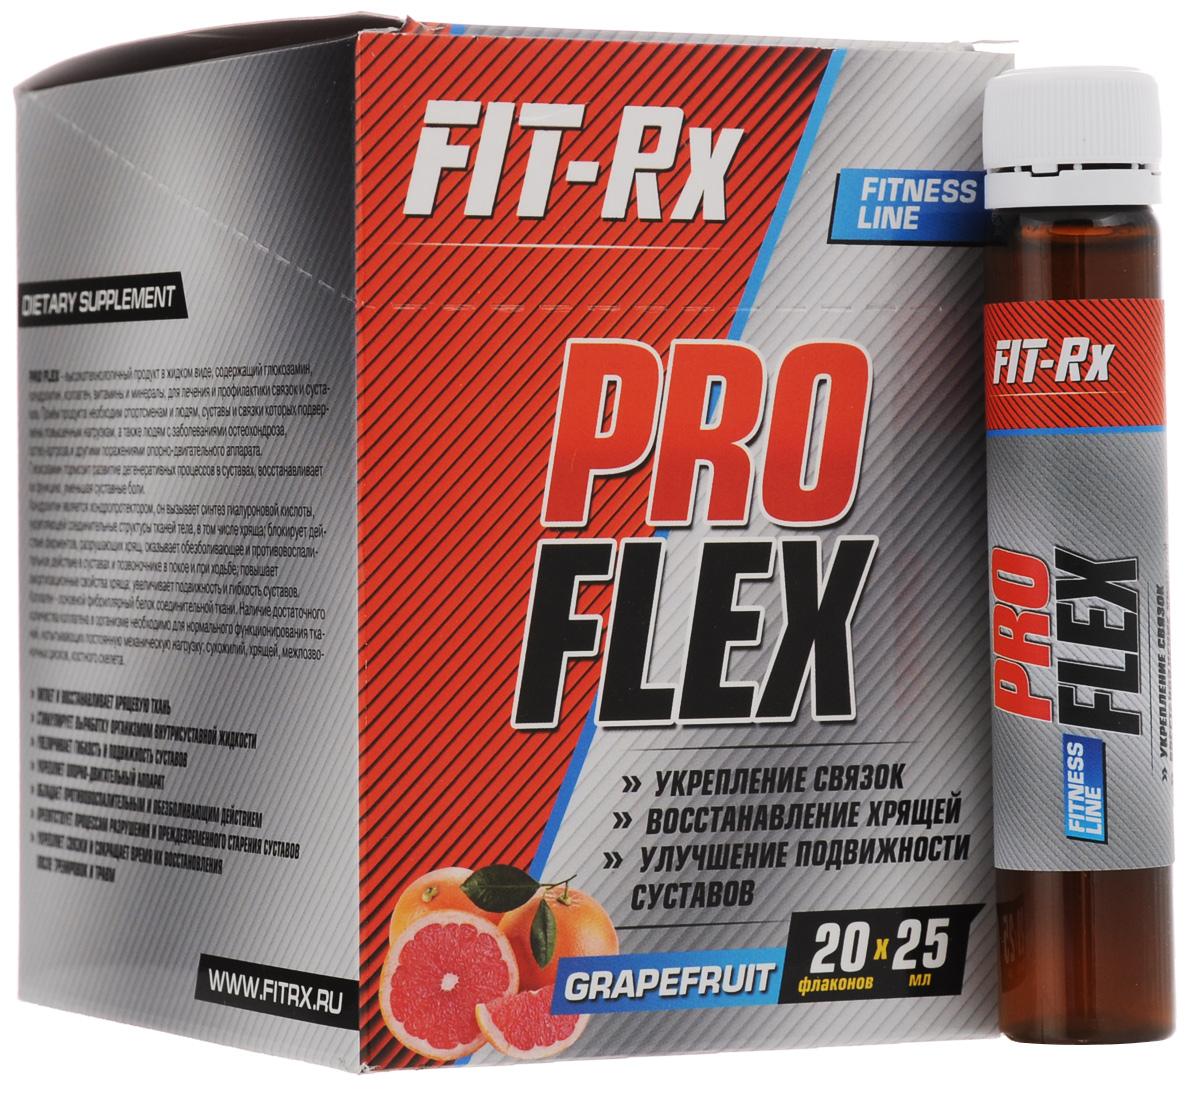 "Препарат для суставов и связок FIT-RX ""Pro Flex"", грейпфрут, 20 х 25 мл"